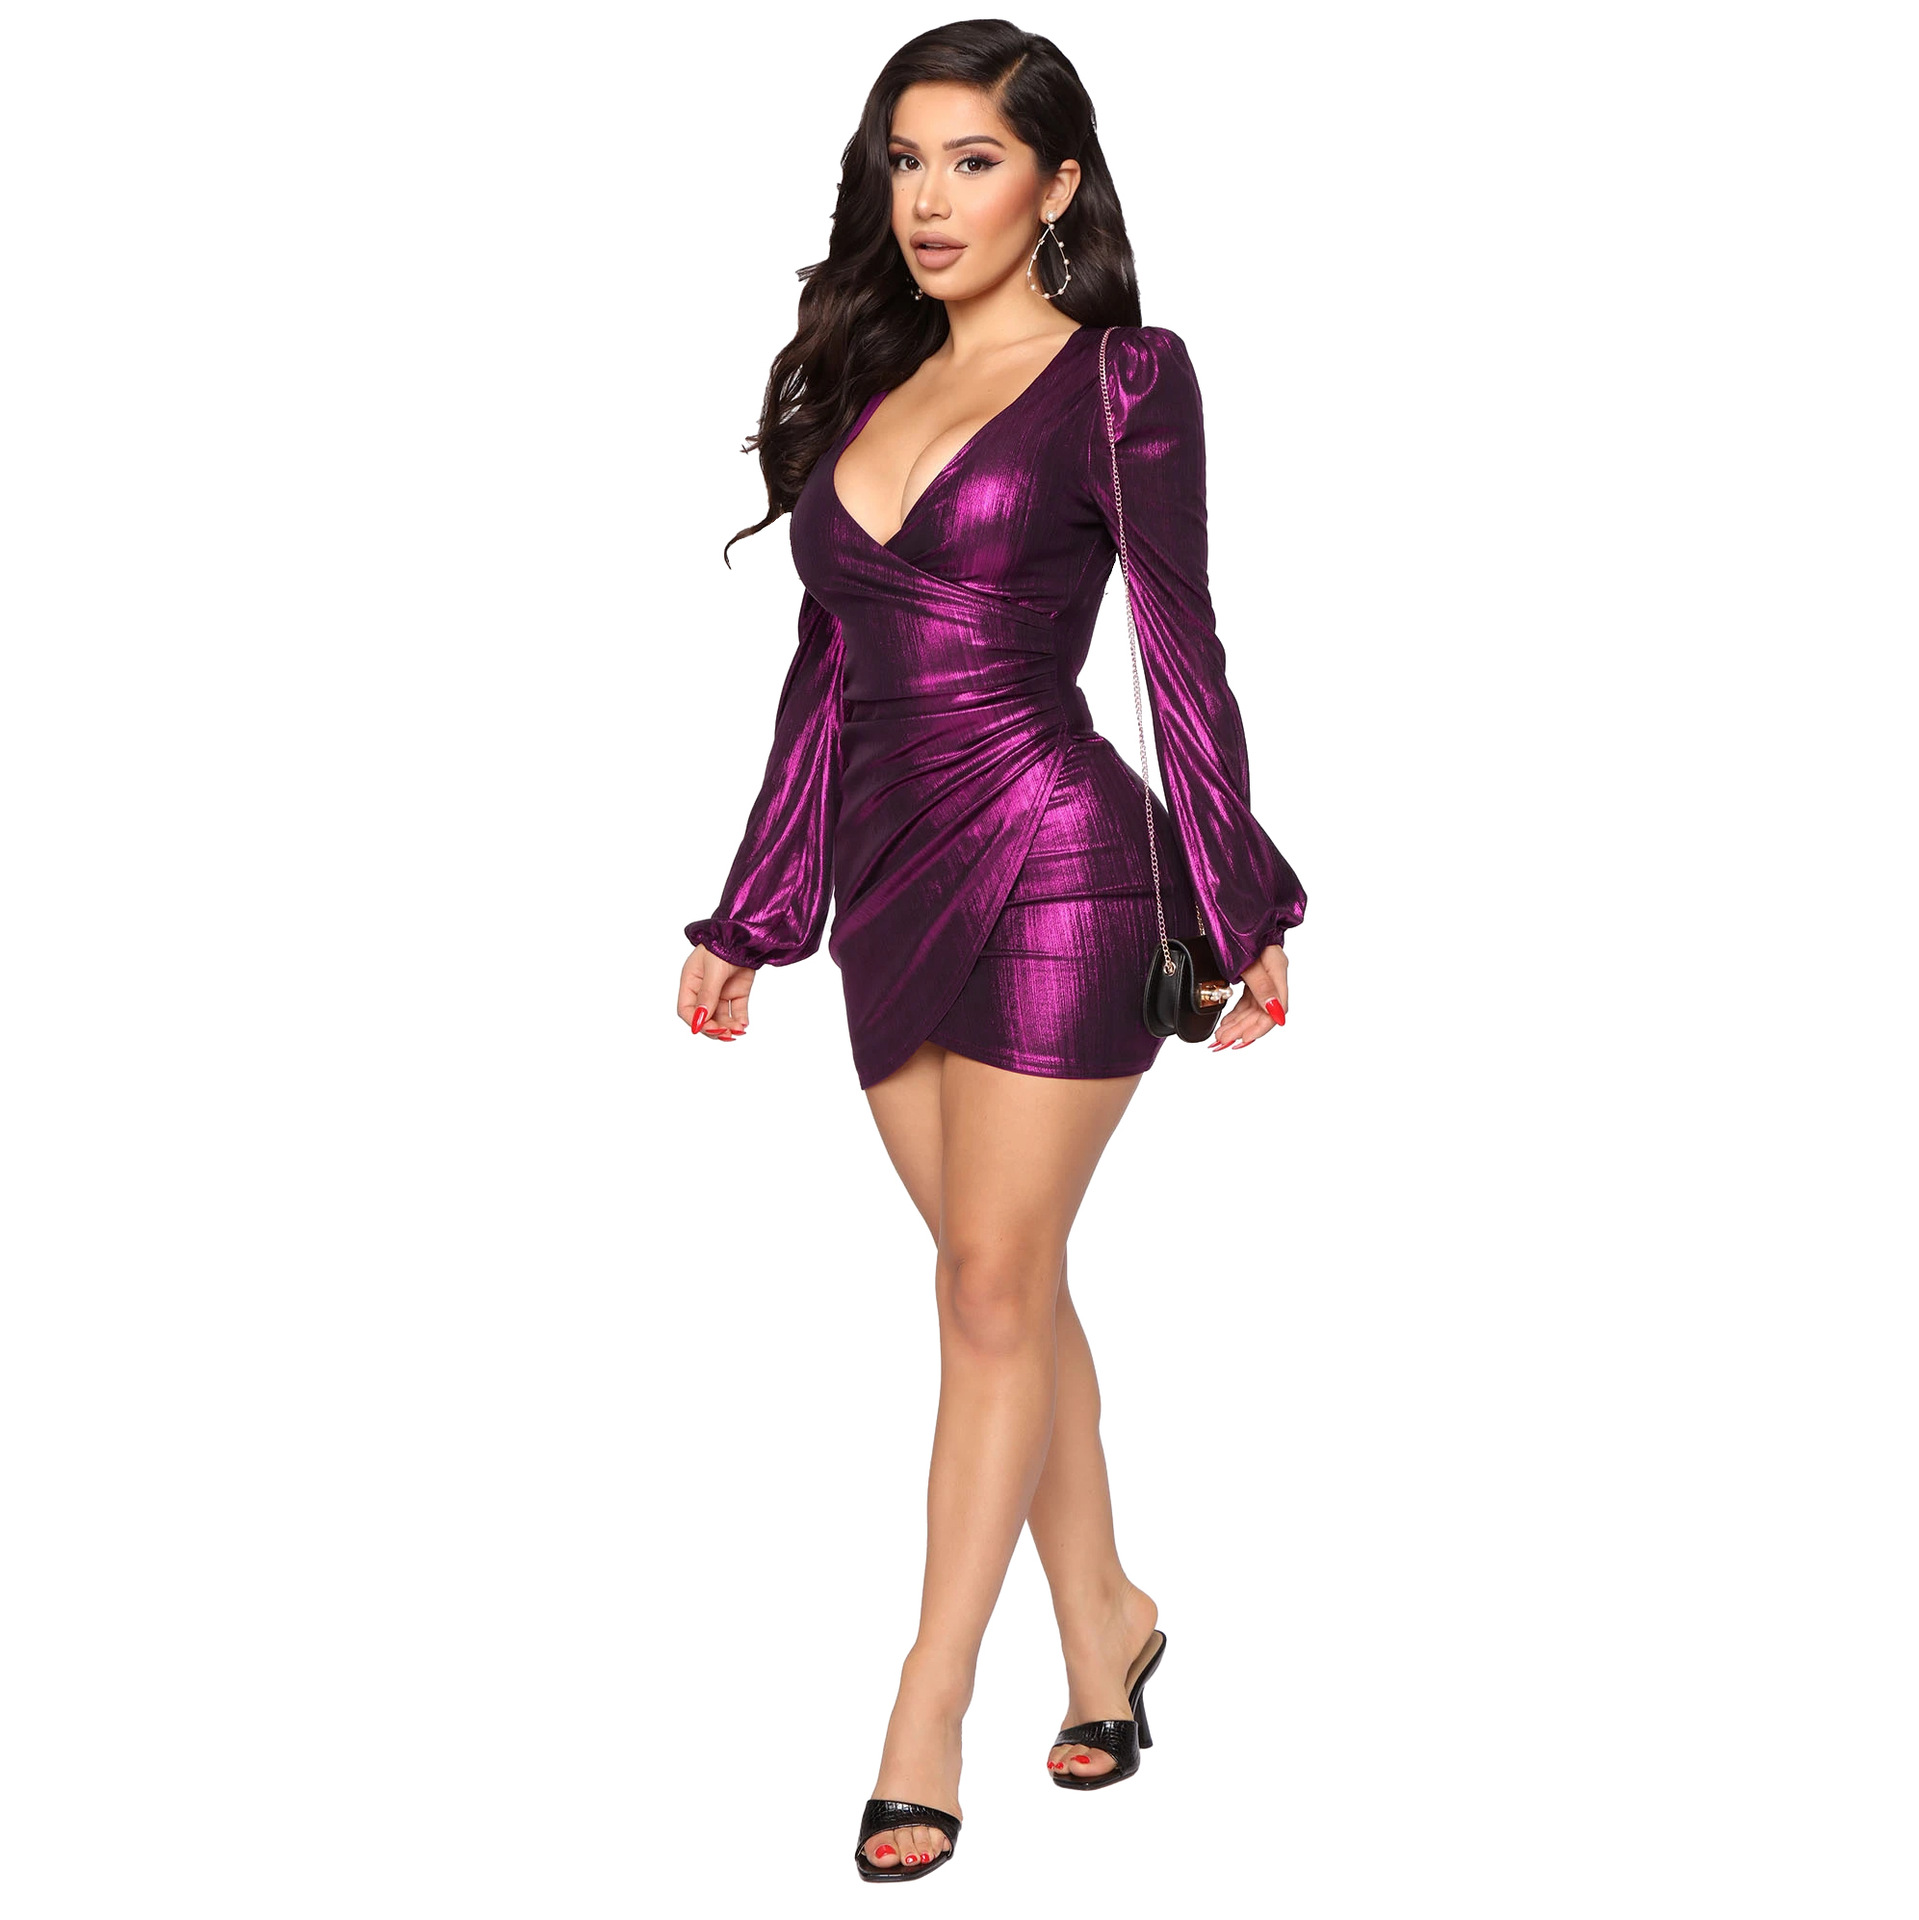 Shiny Bronzing Ribbed Elegant Bandage Dress Women Sexy Deep V Neck Long Sleeve Ruched Dresses Vintage High Waist Slim Fit Dress 7